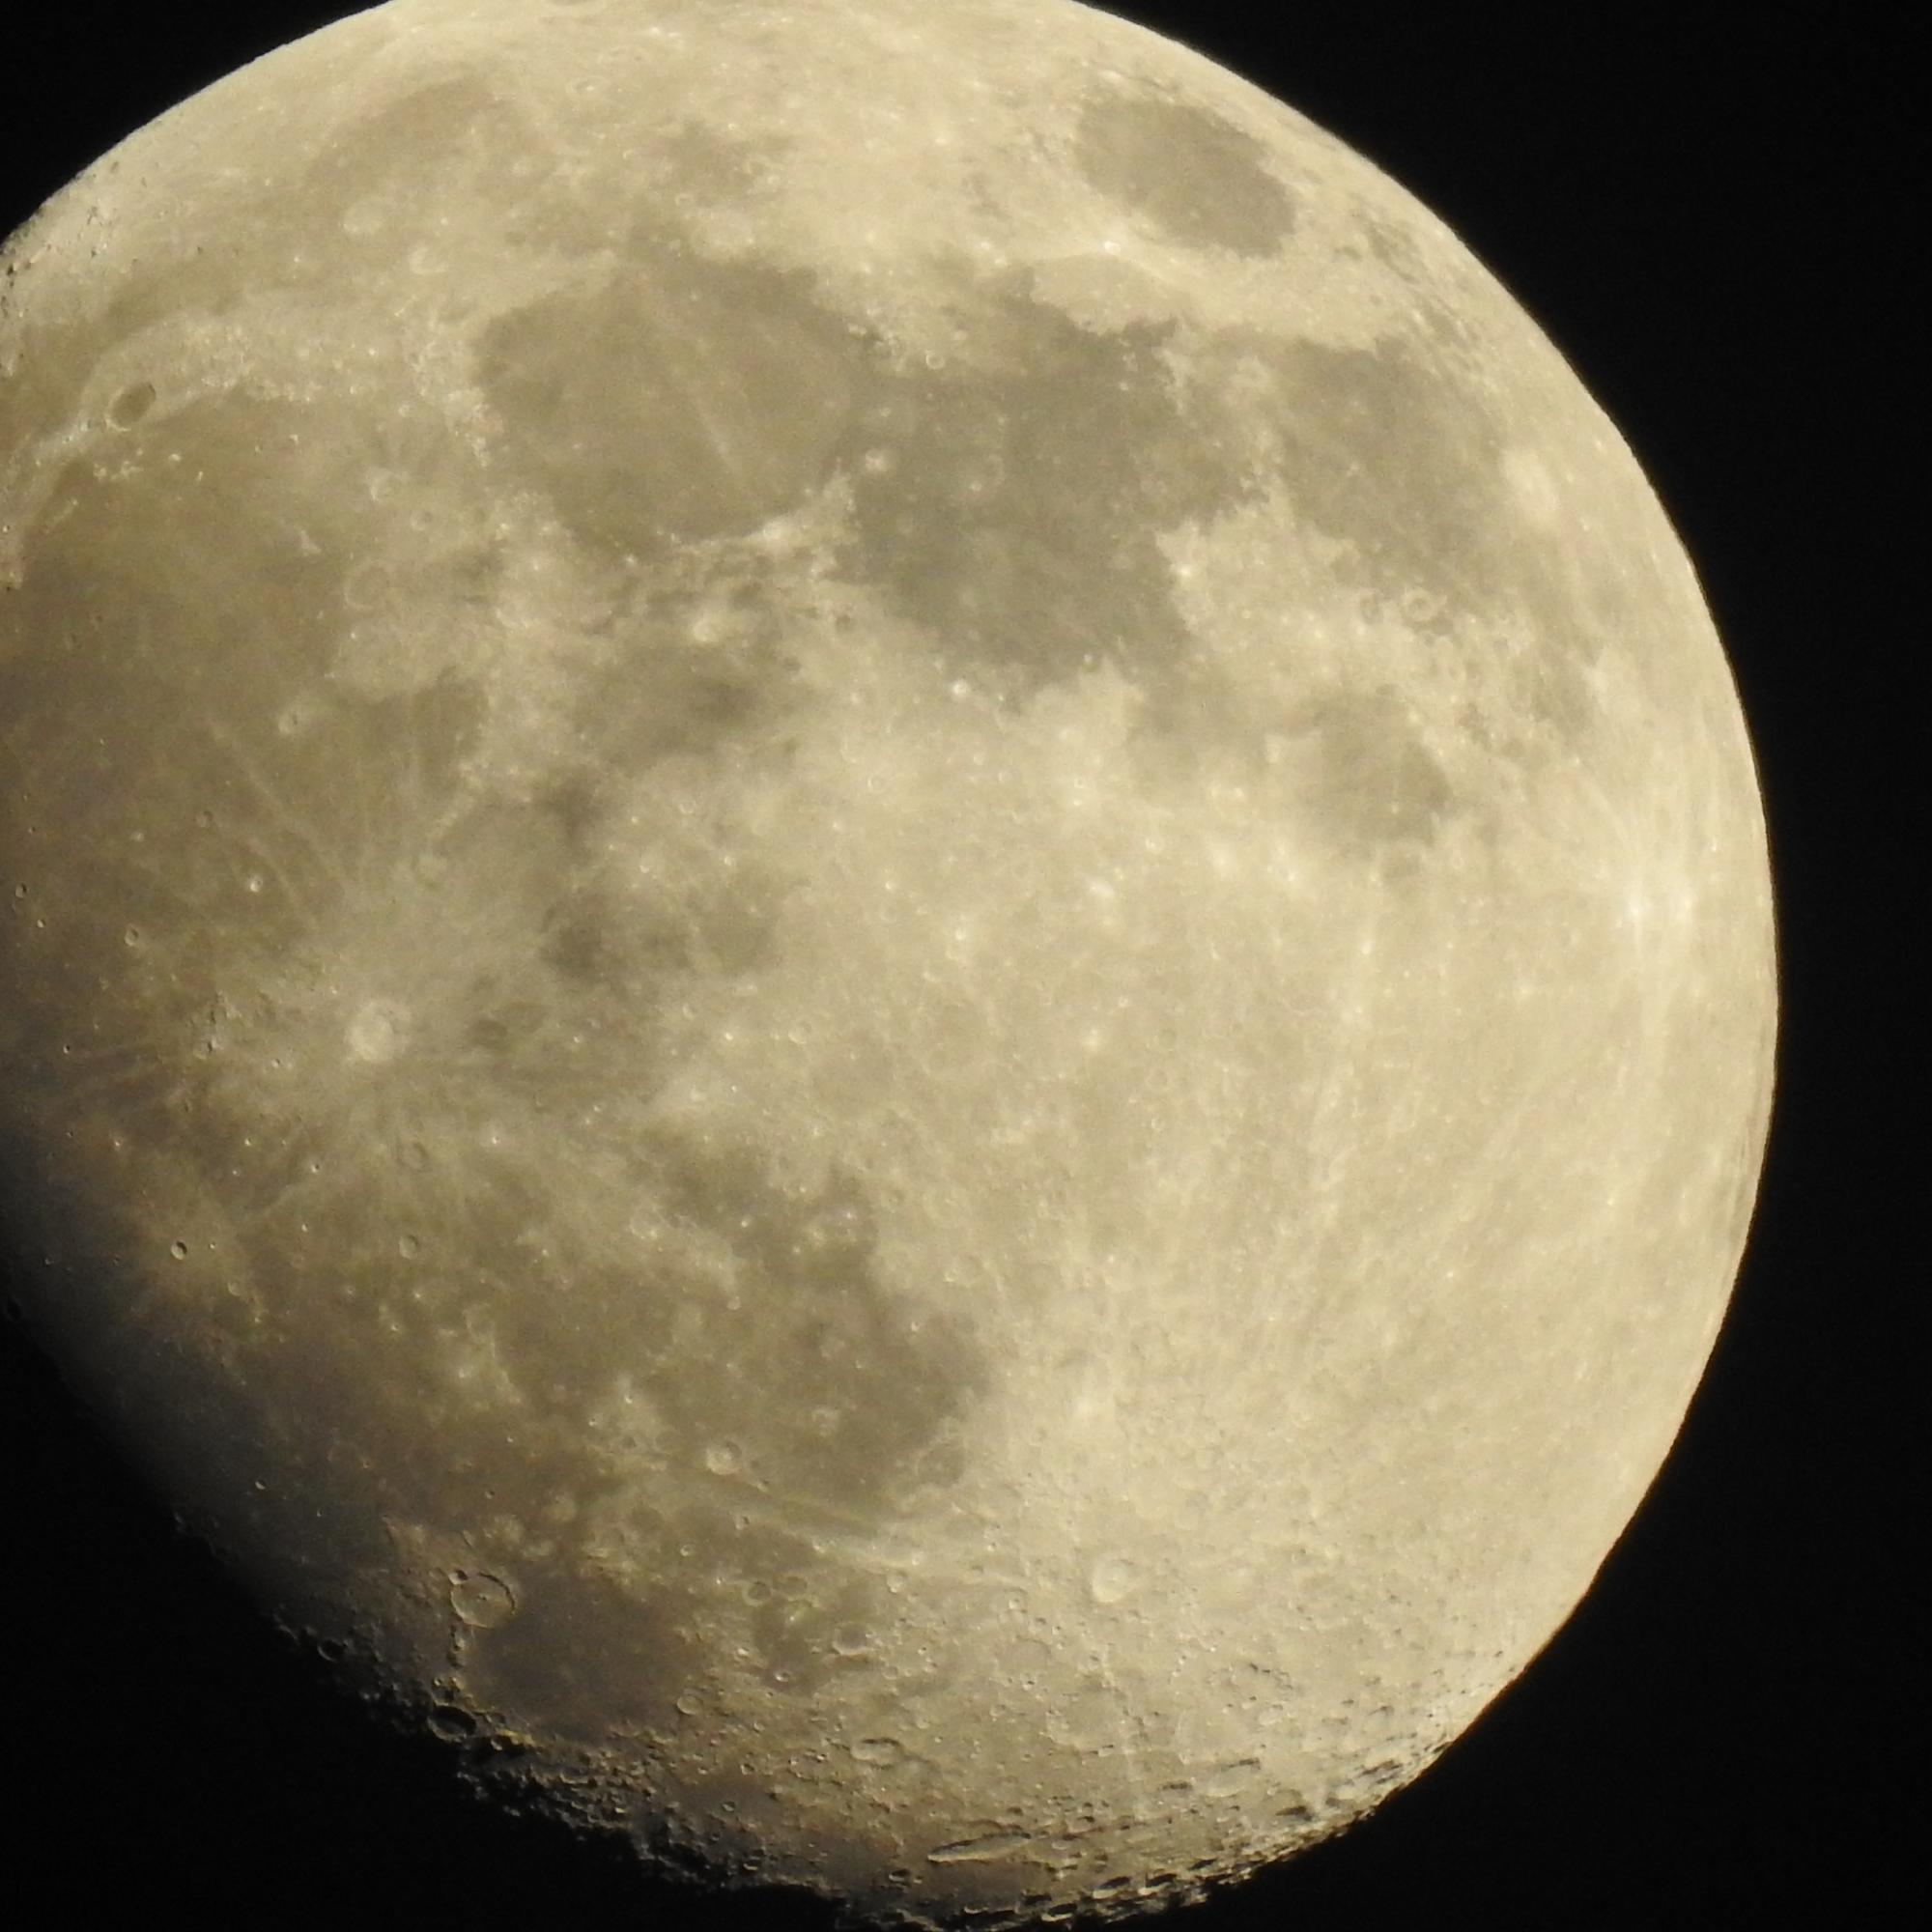 Moon shot over Michigan